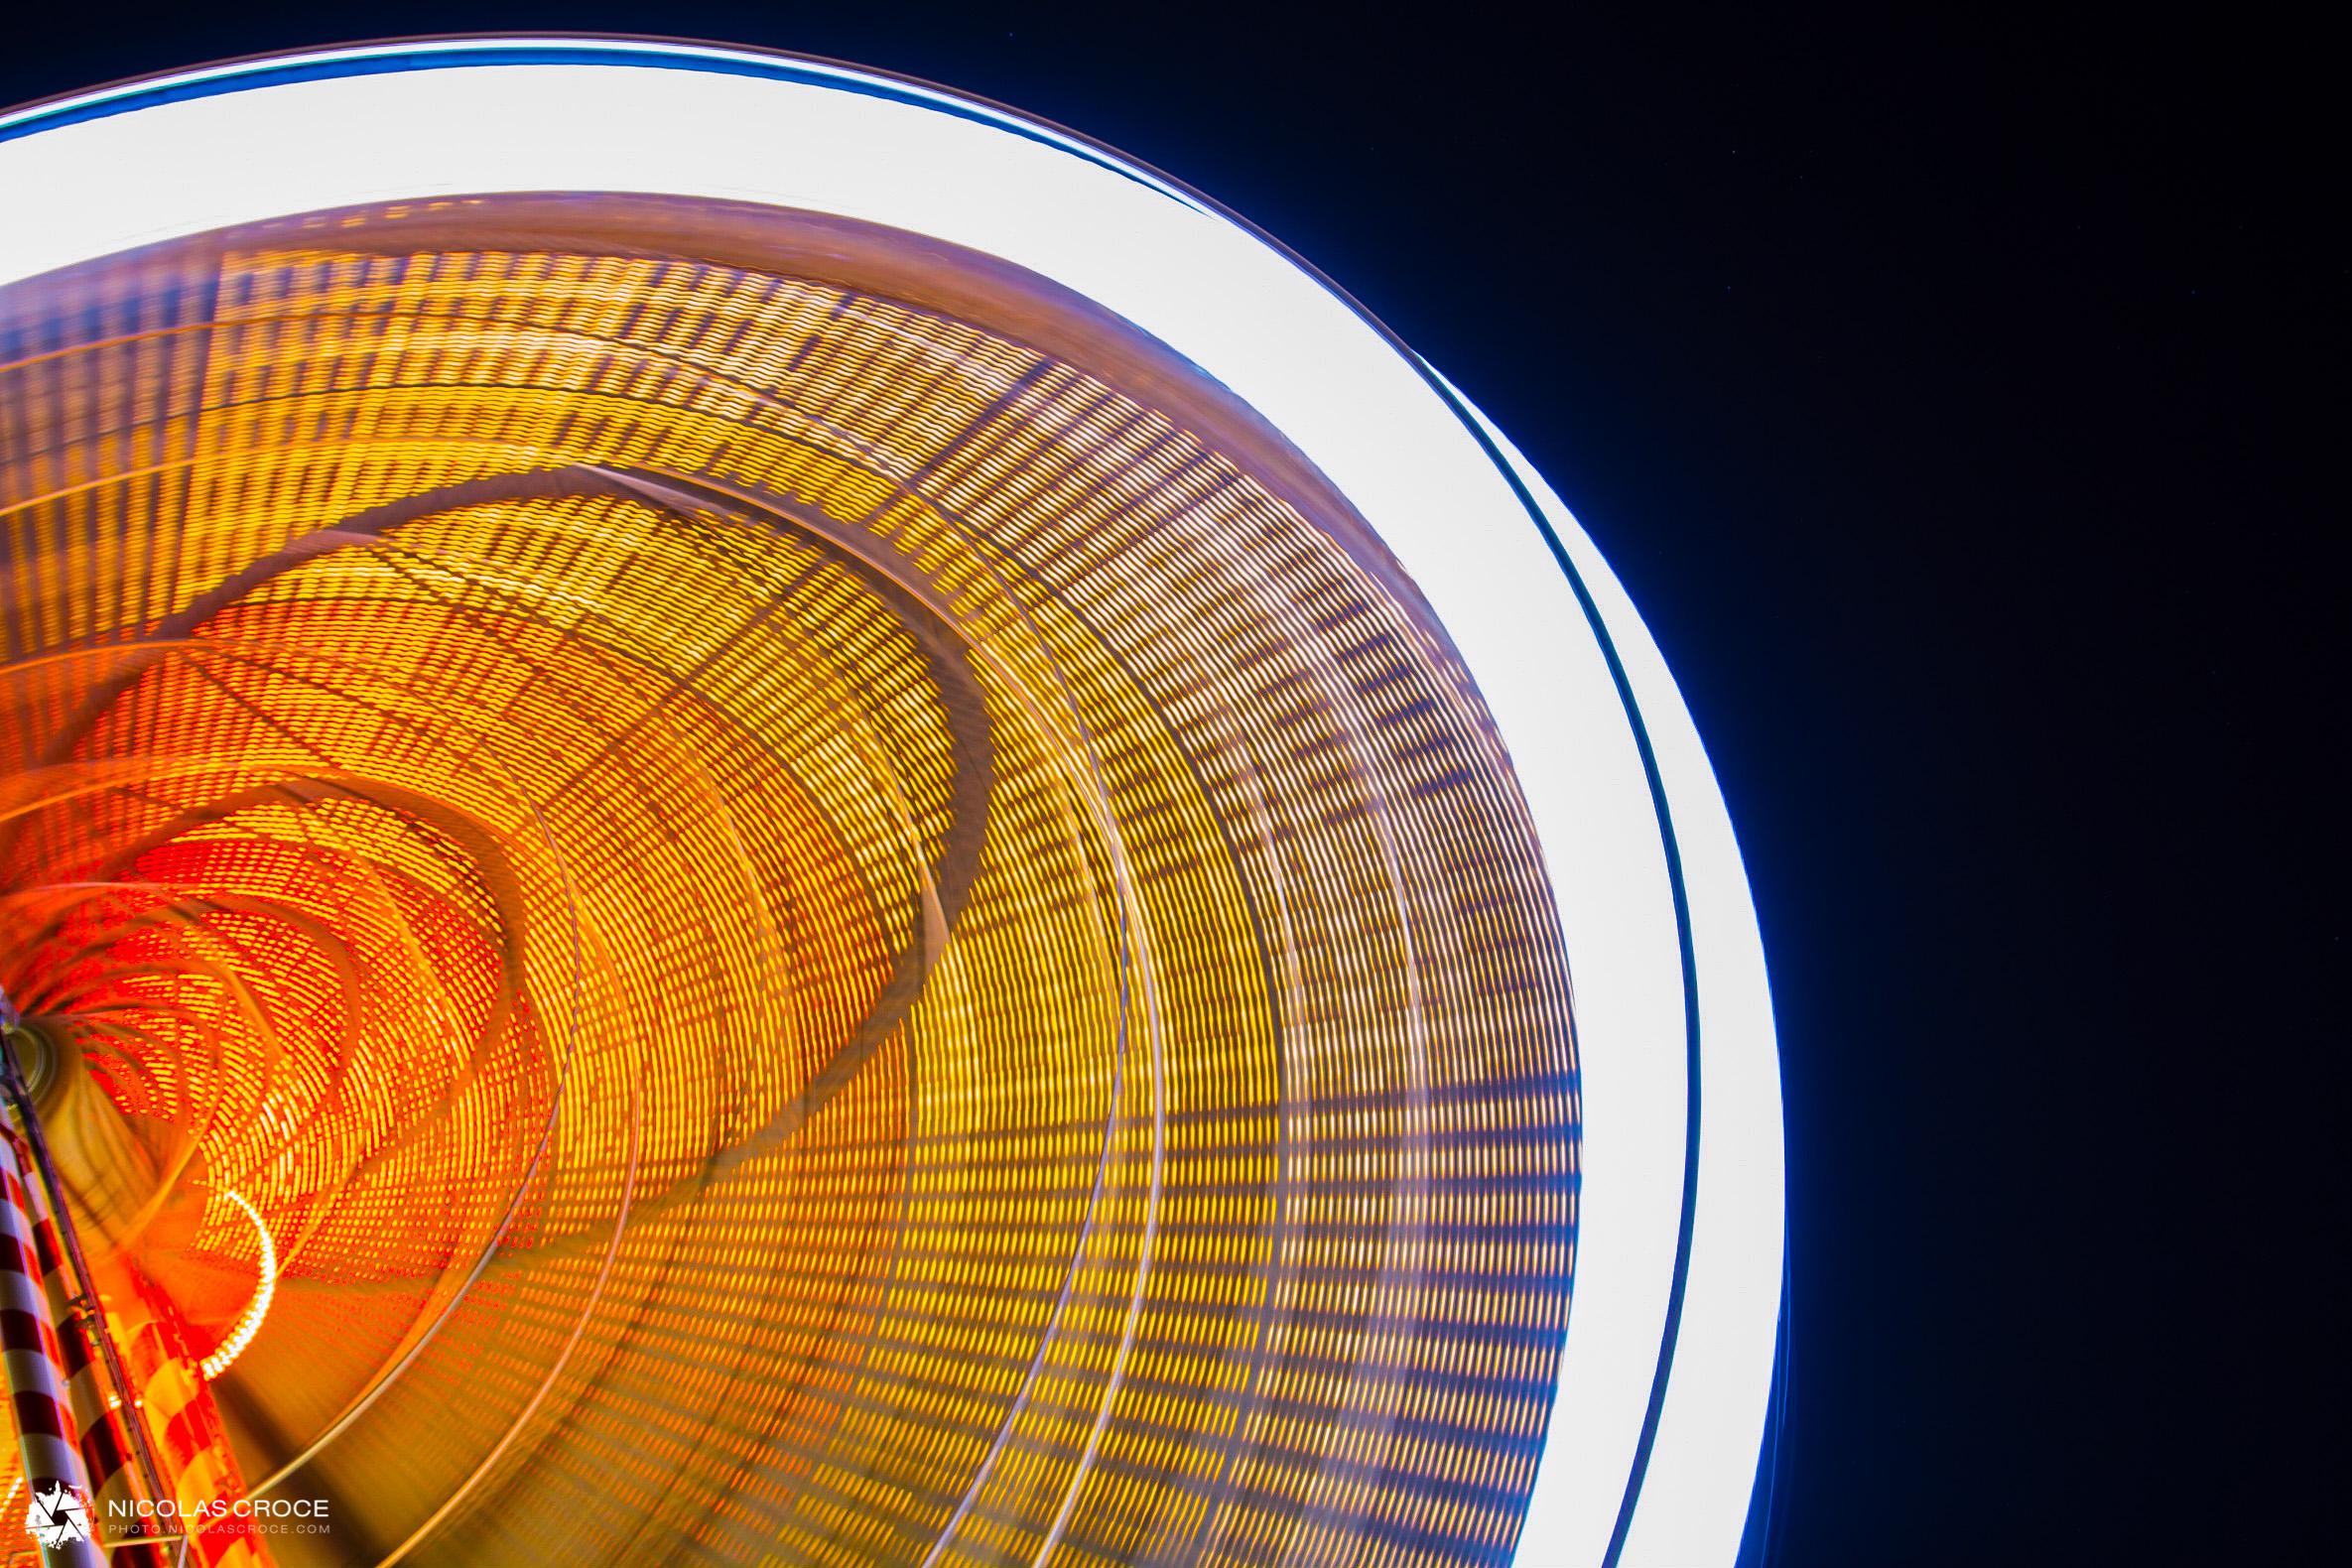 Ferris wheel in toulouse, long exposure